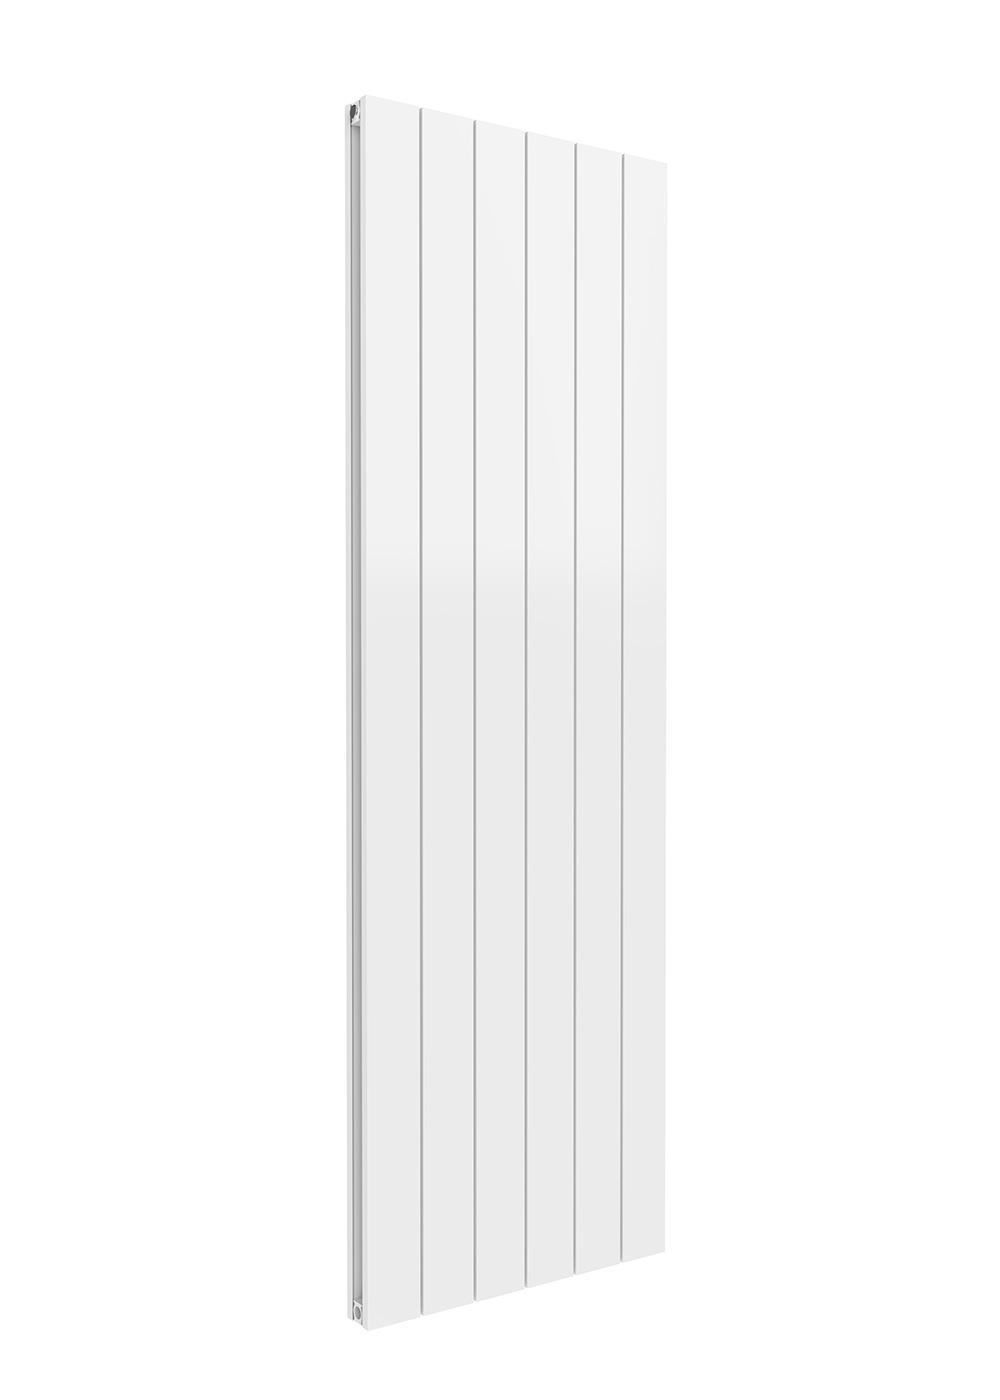 Reina Casina Single Vertical